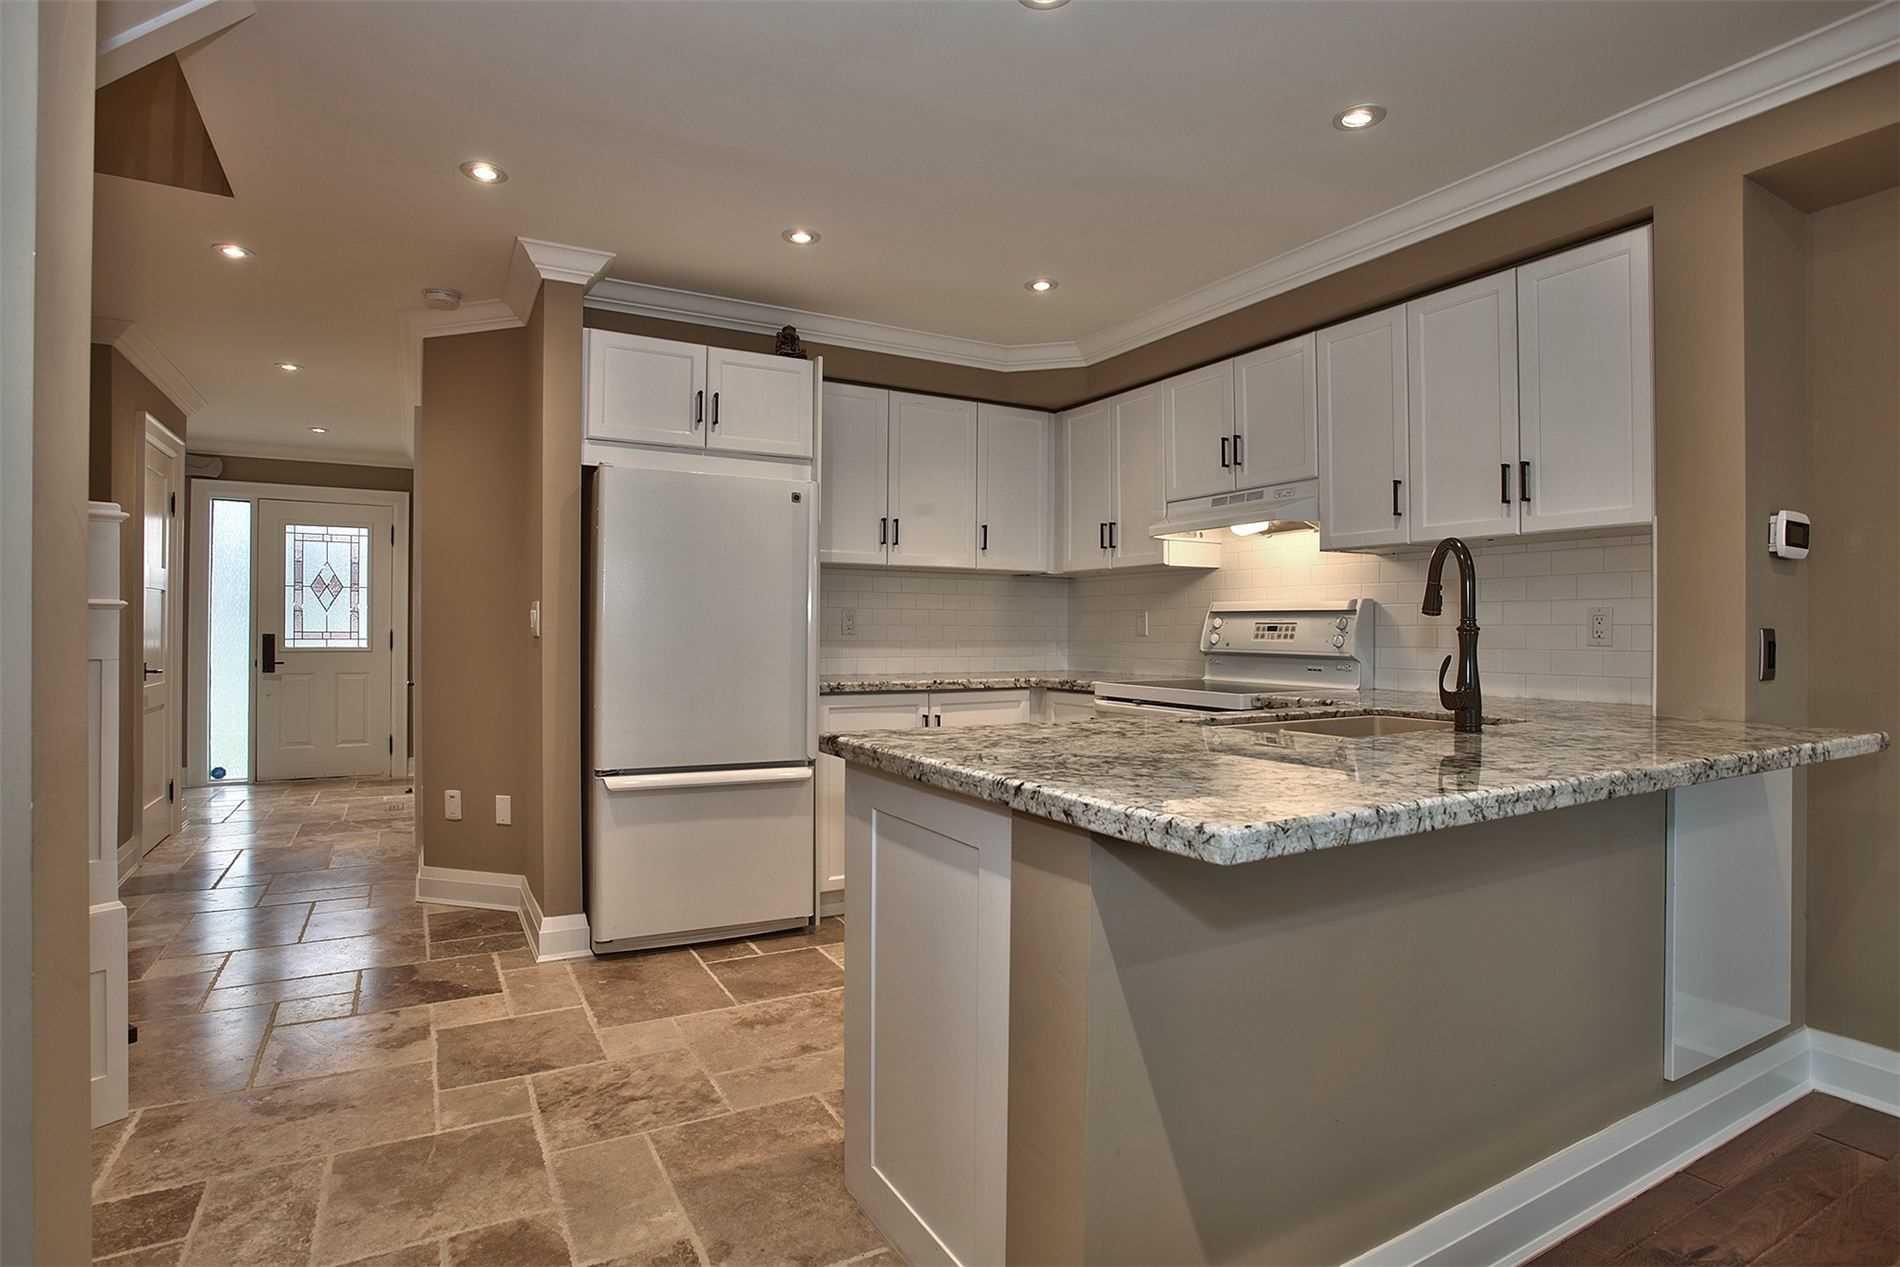 1240 Westview Terr, Oakville, Ontario L6M3M4, 3 Bedrooms Bedrooms, ,3 BathroomsBathrooms,Condo Townhouse,For Lease,Westview,W5182648